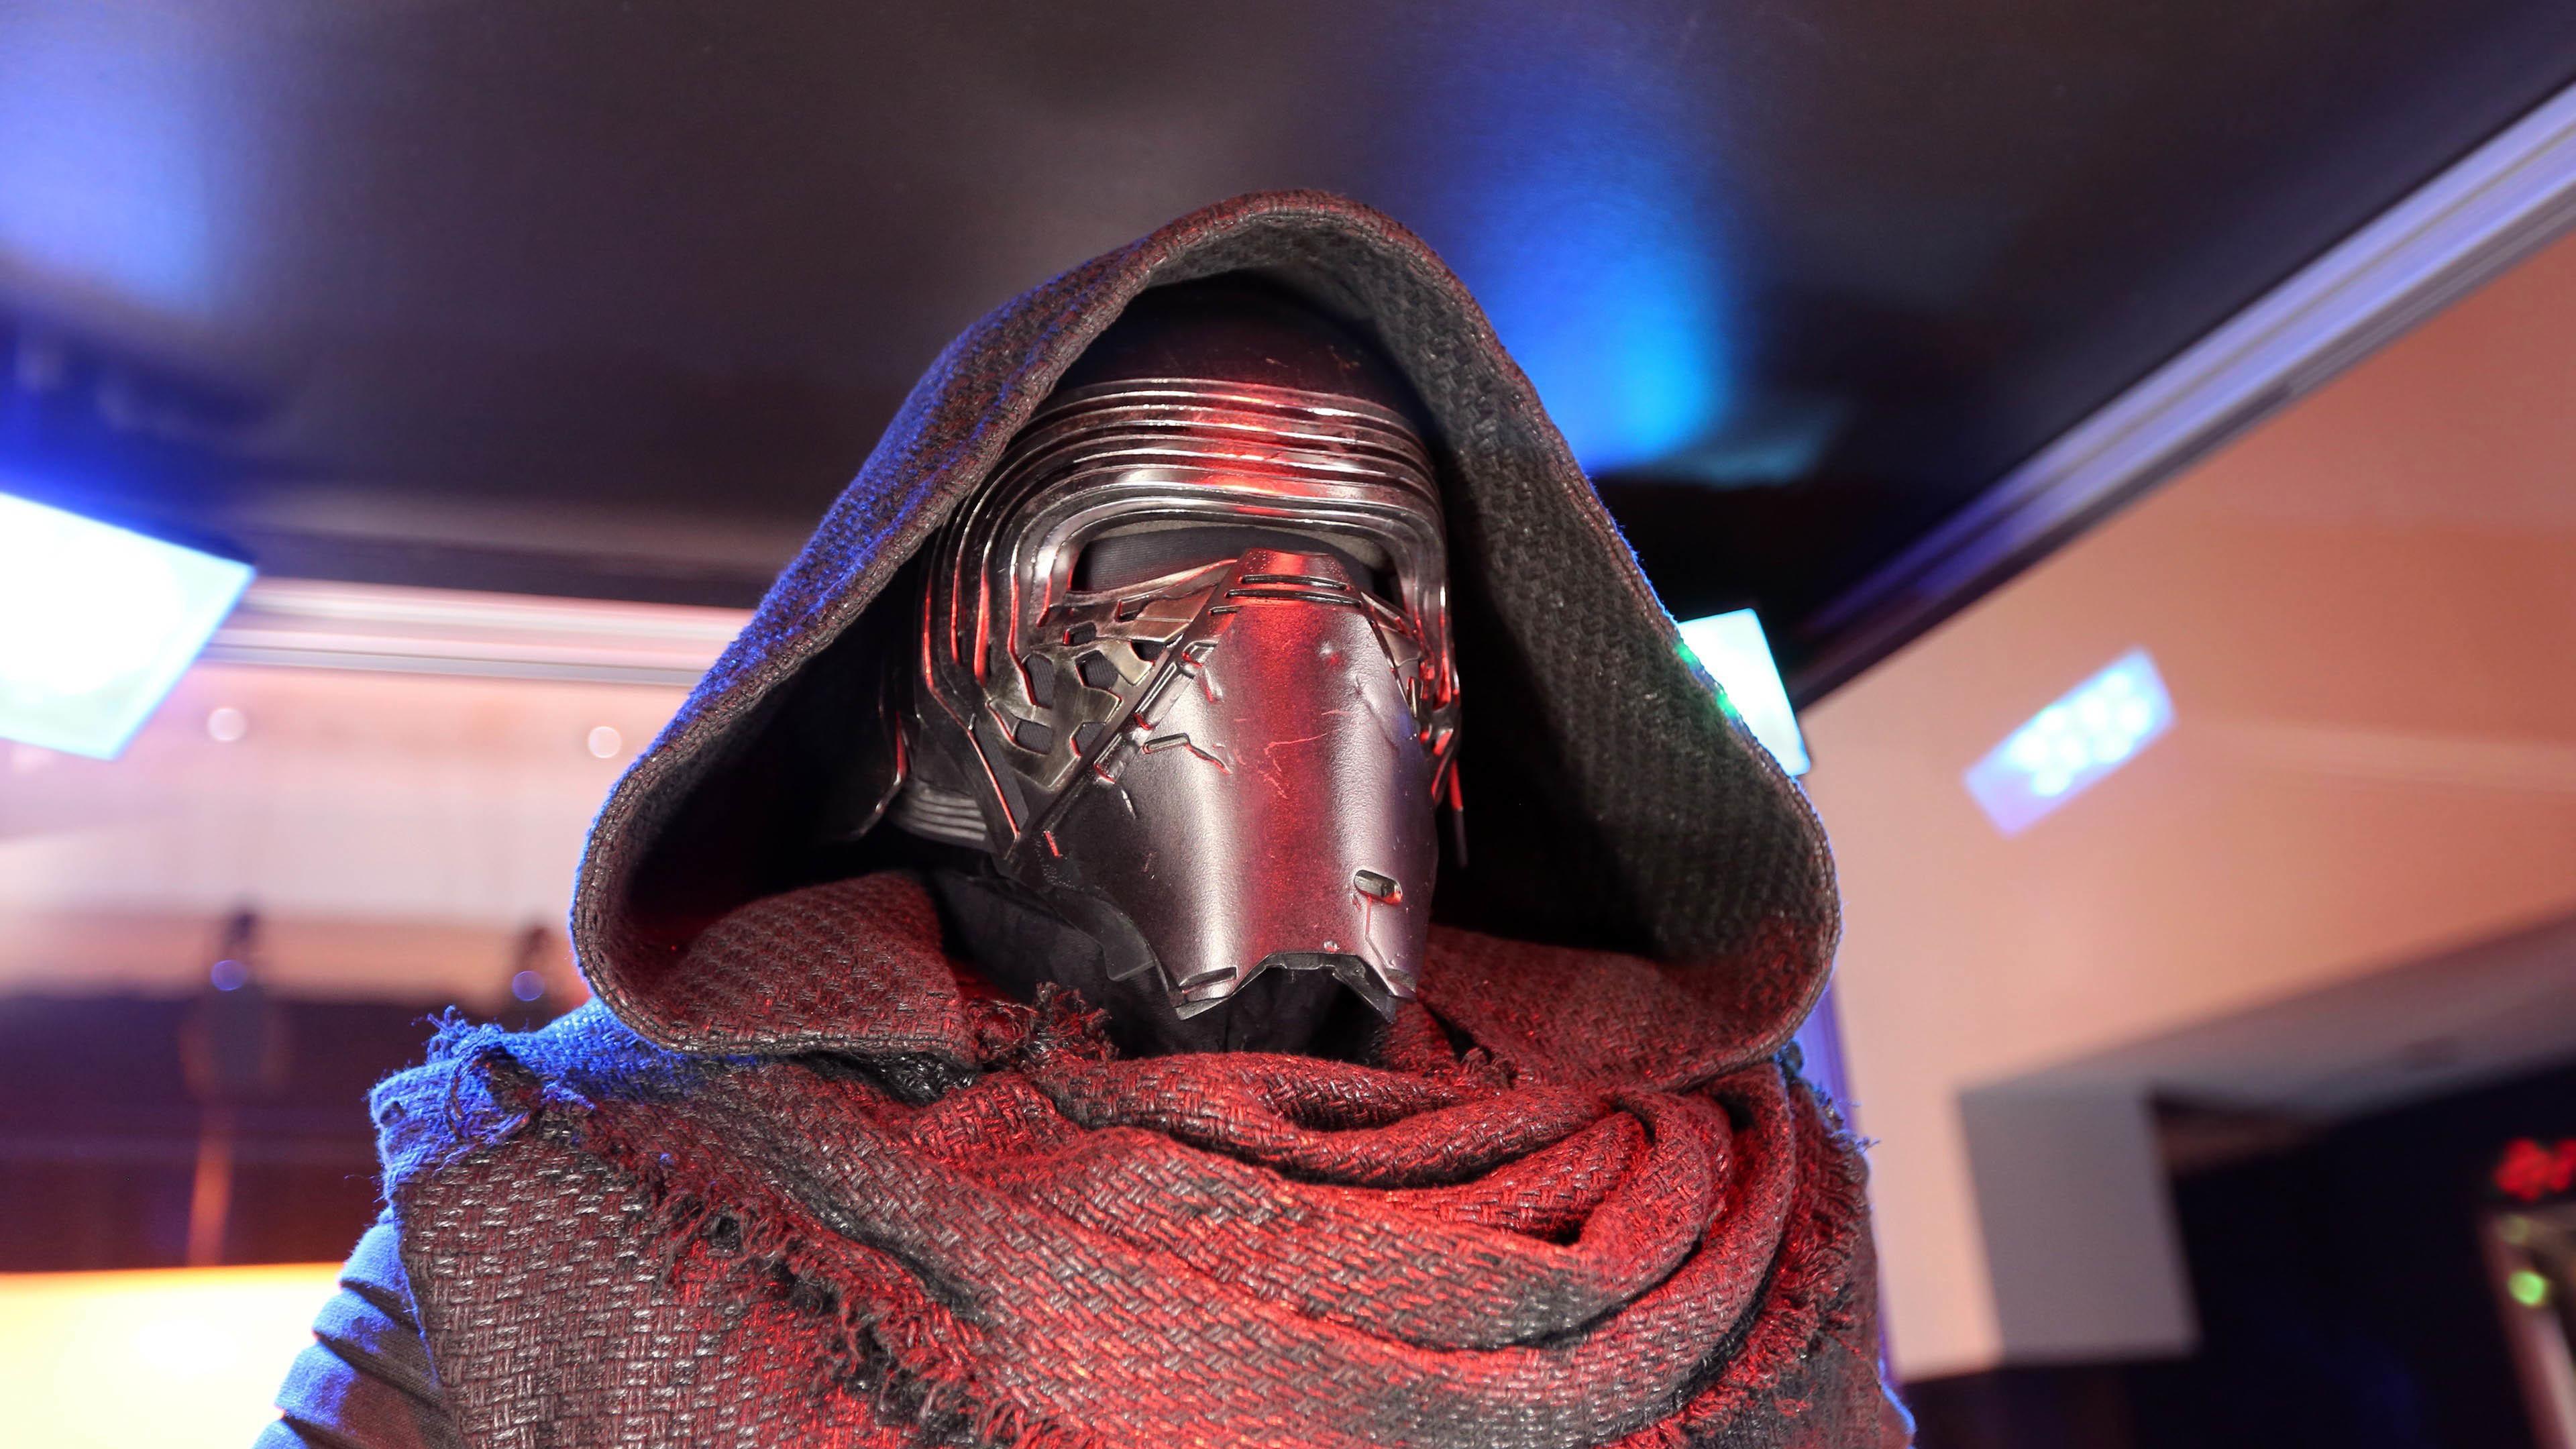 Driver as Kylo Ren – Star Wars: The Force Awakens wallpaper .